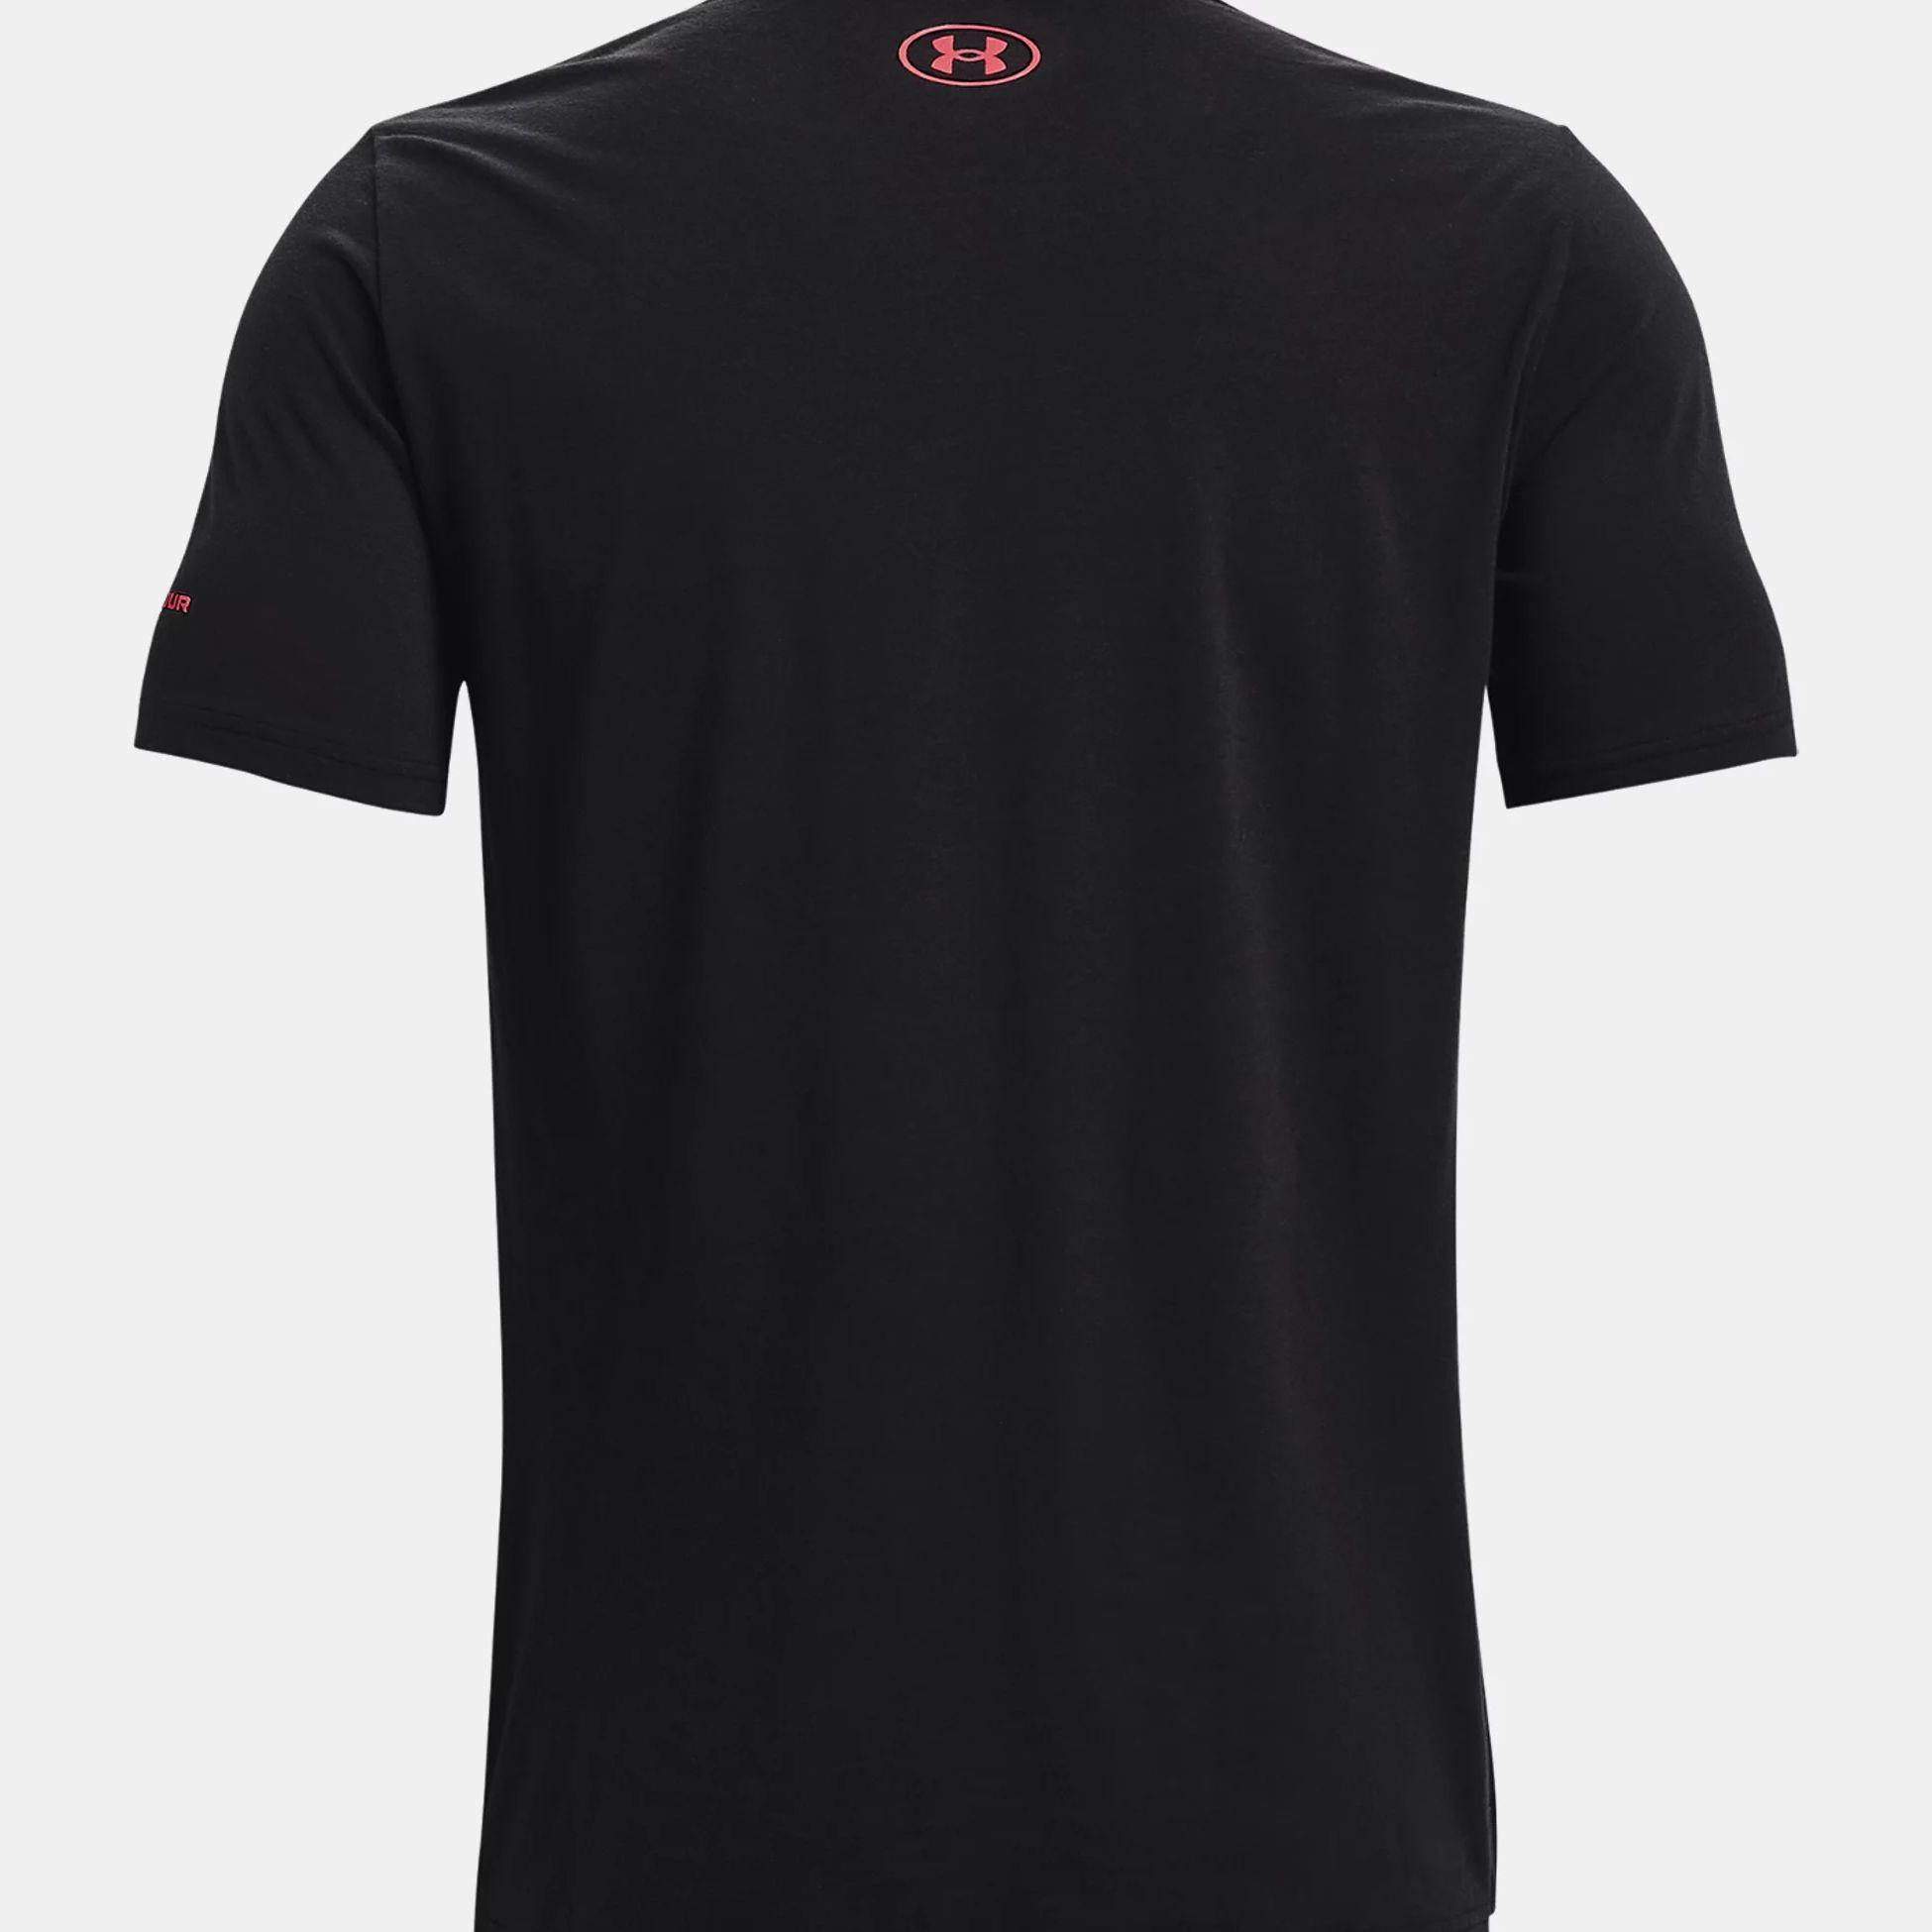 Îmbrăcăminte -  under armour Vertical Wordmark Short Sleeve